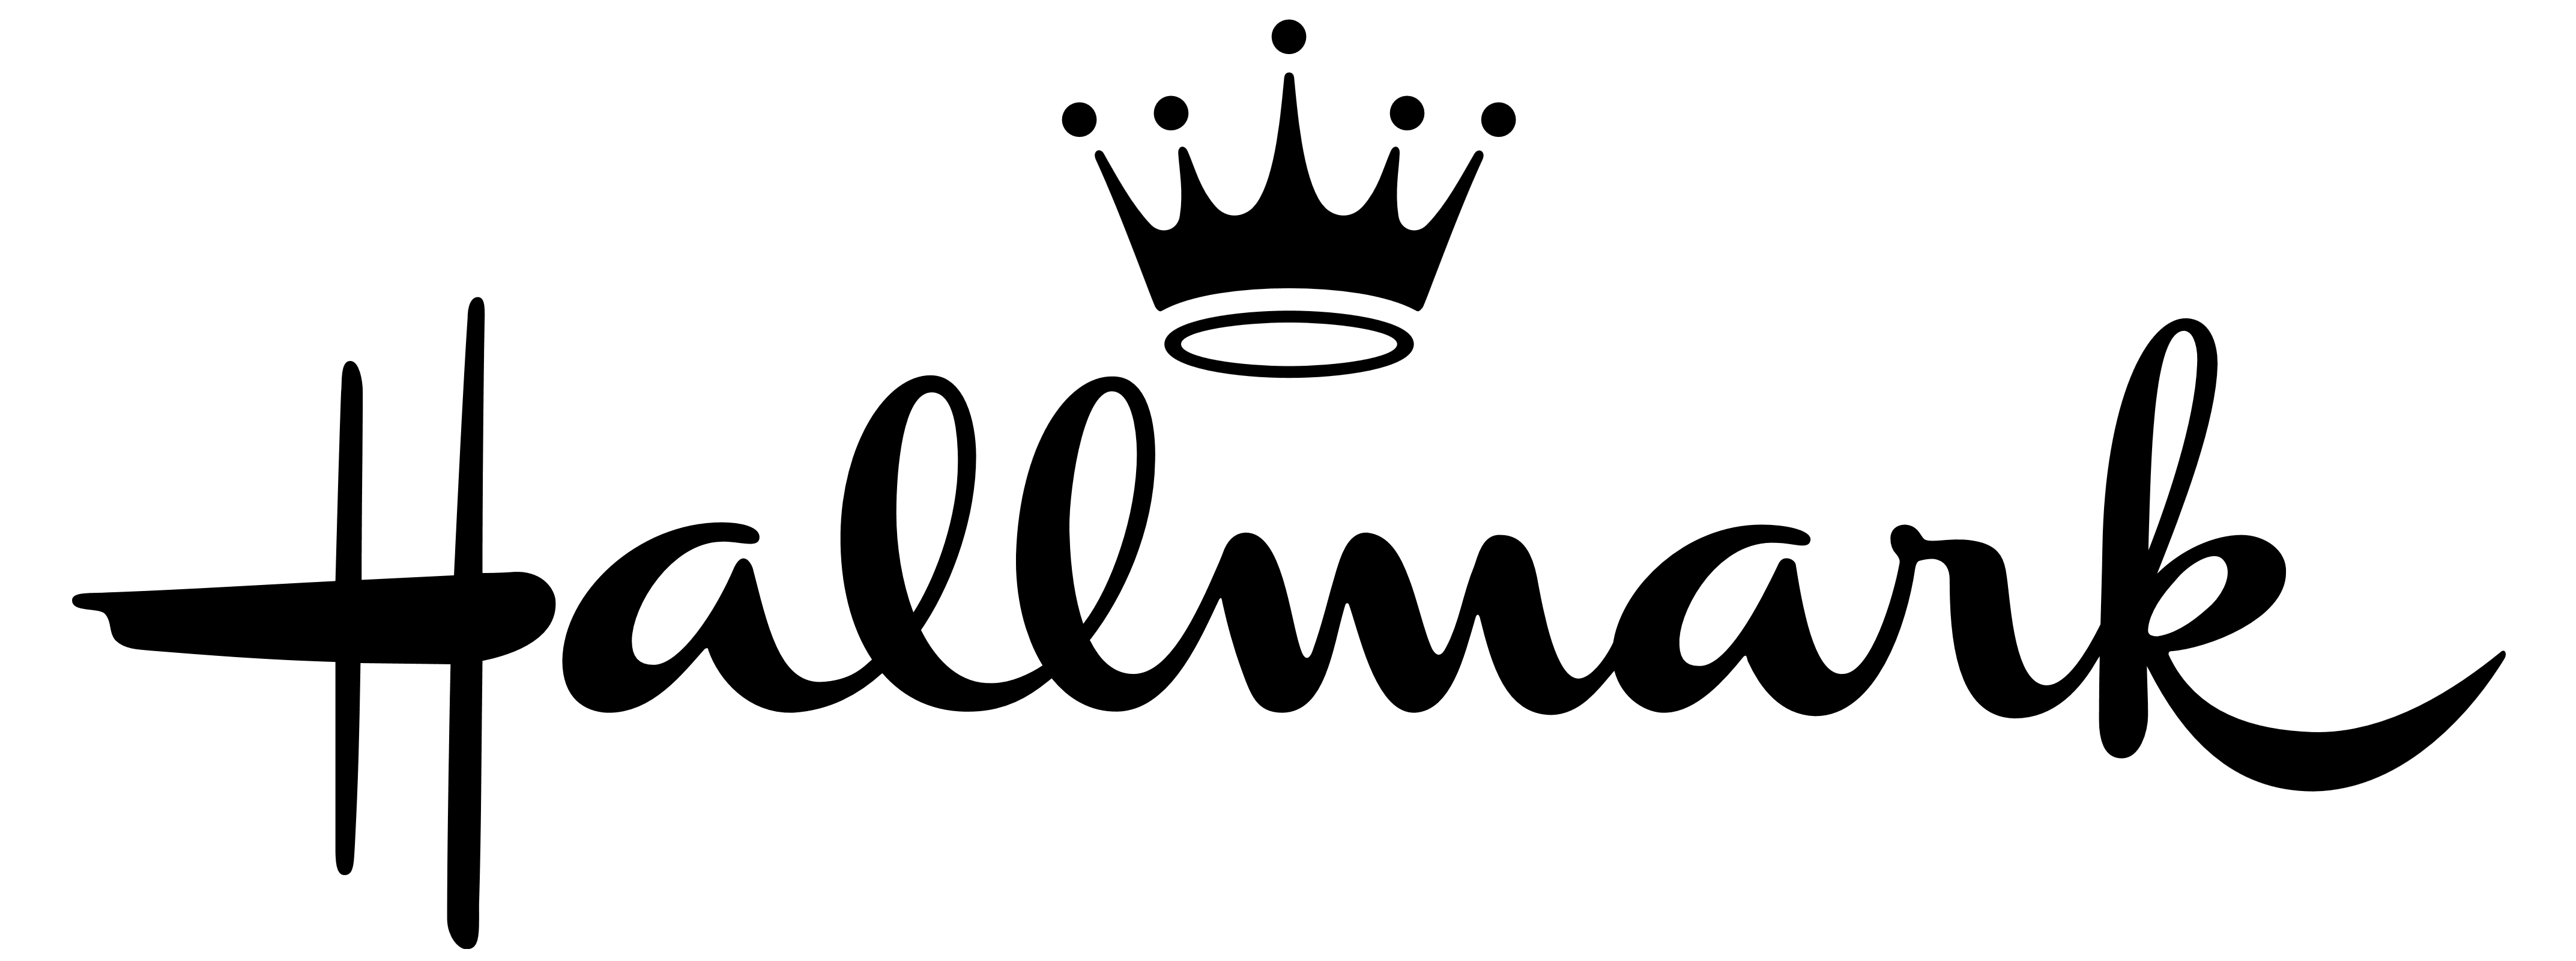 Hallmark_logo_logotype